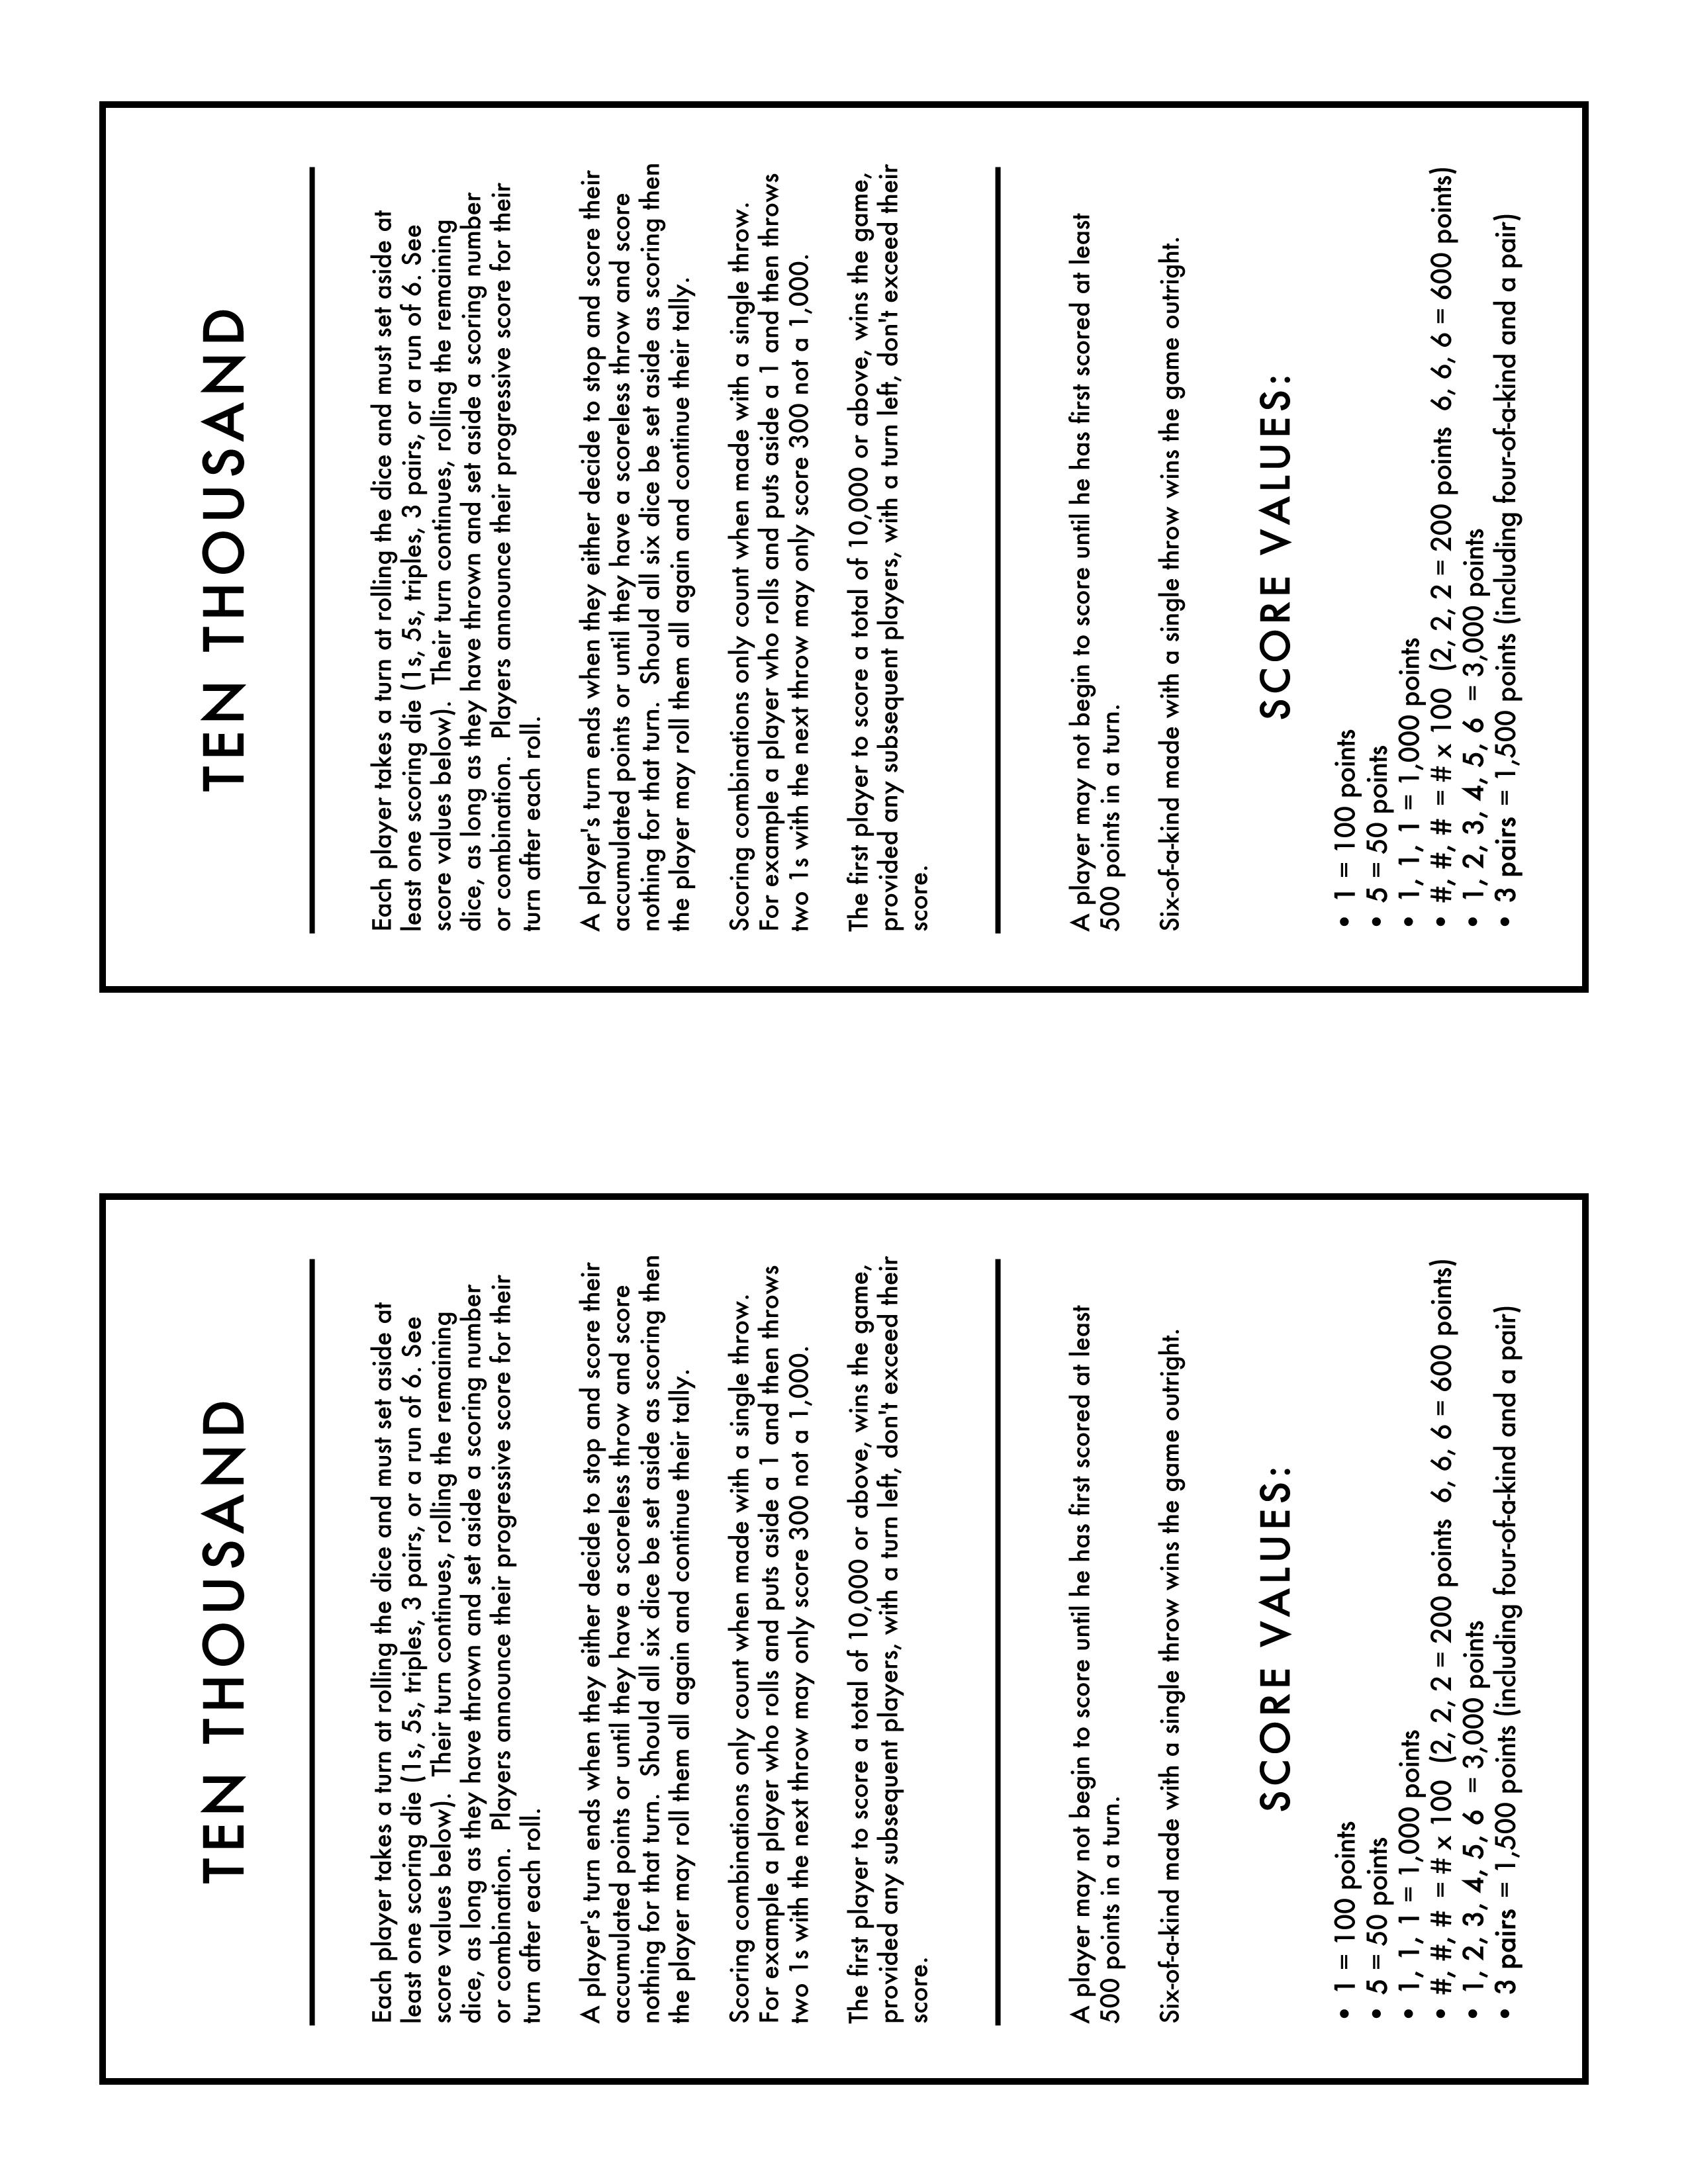 image regarding Farkle Rules Printable named Farkle Ranking Sheet Printable Farkle Scoring Playing cards